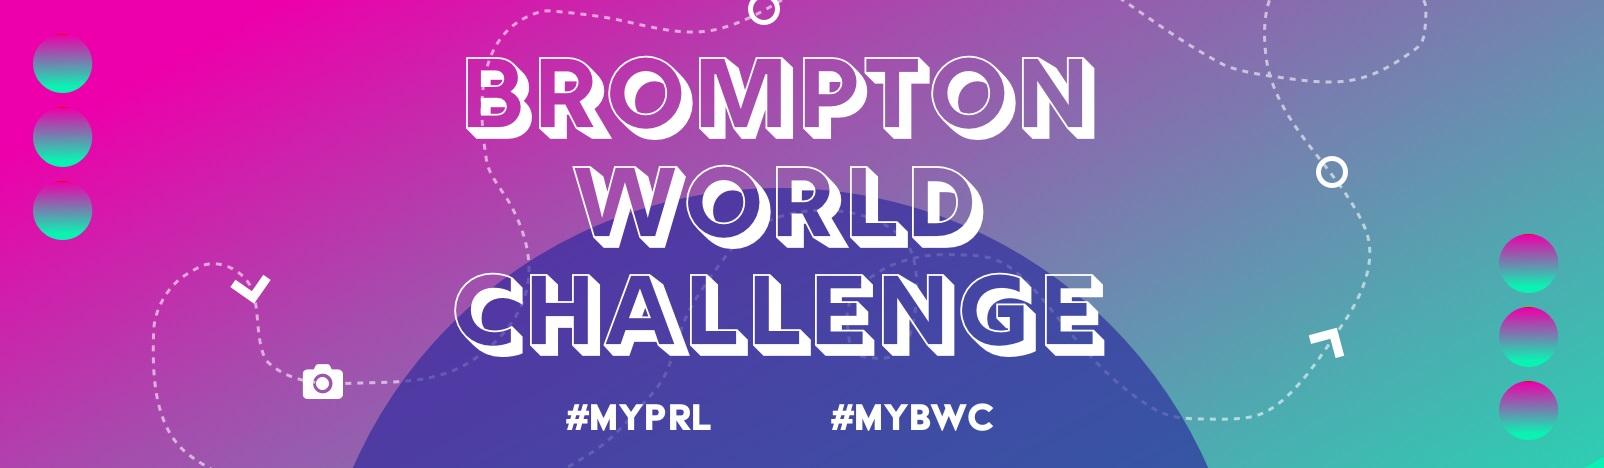 Brompton World Challenge